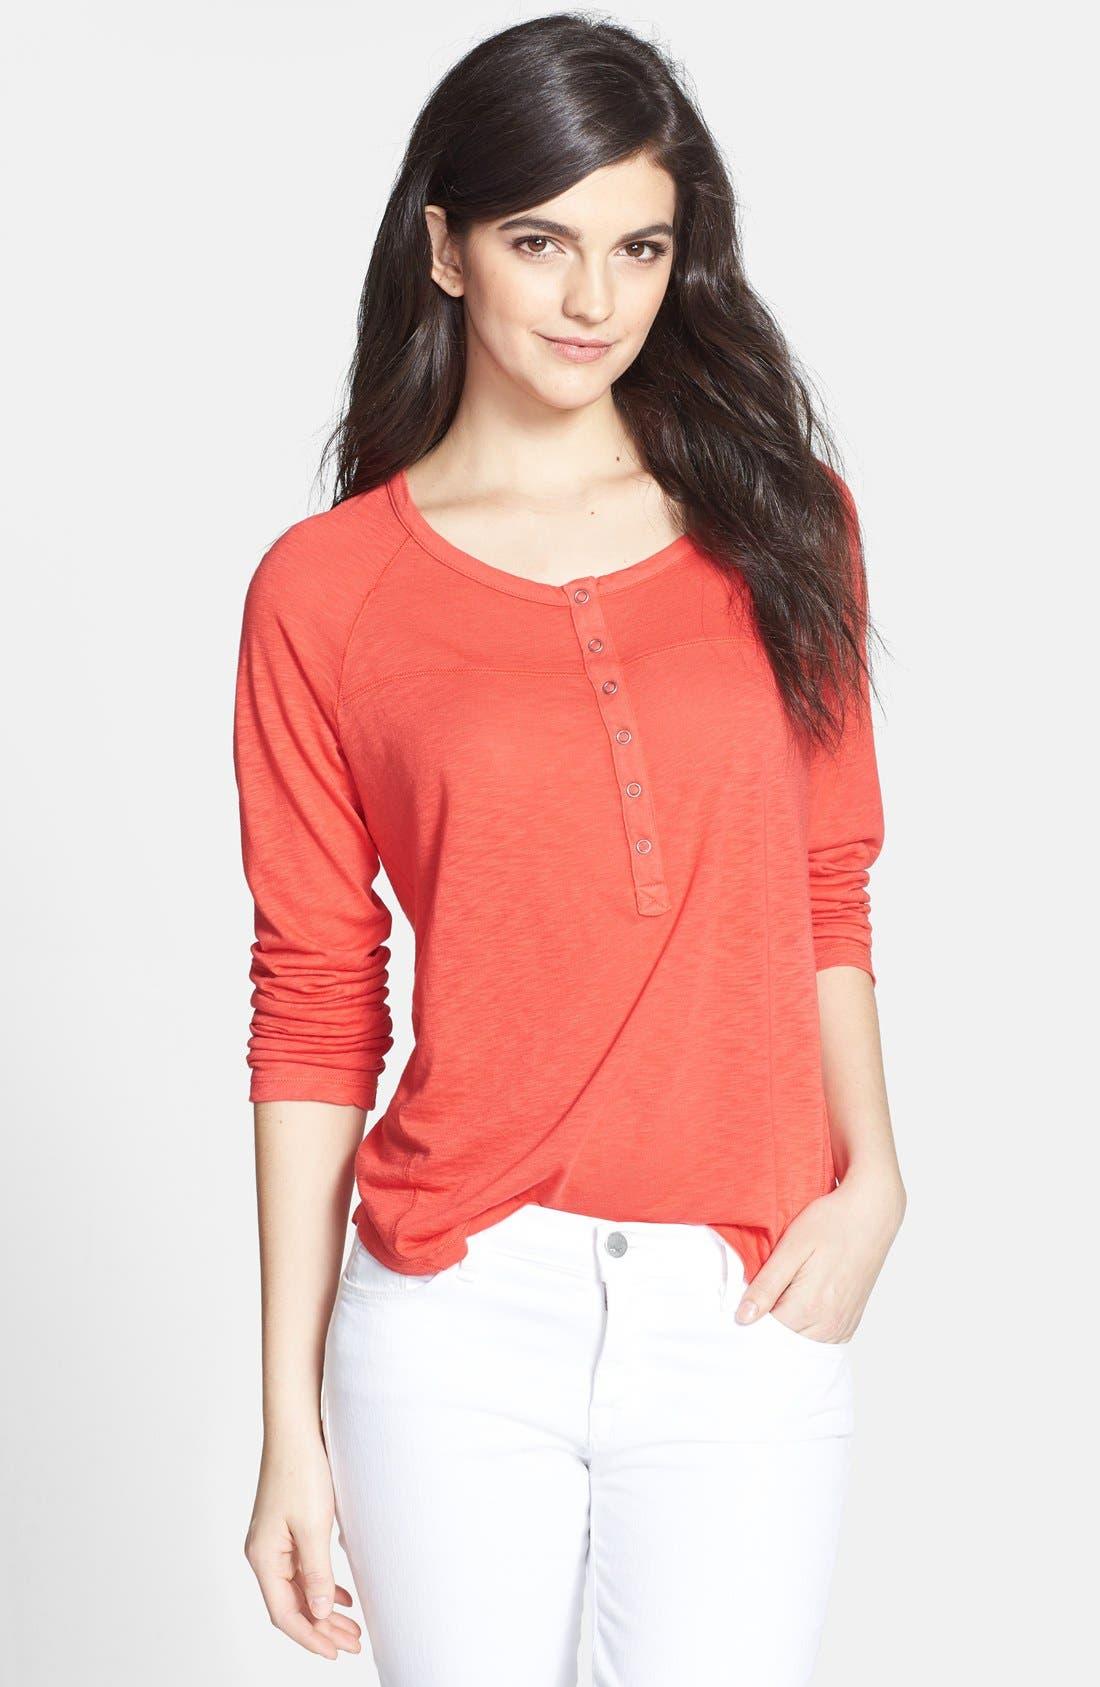 Alternate Image 1 Selected - Splendid Slub Knit Cotton Blend Top